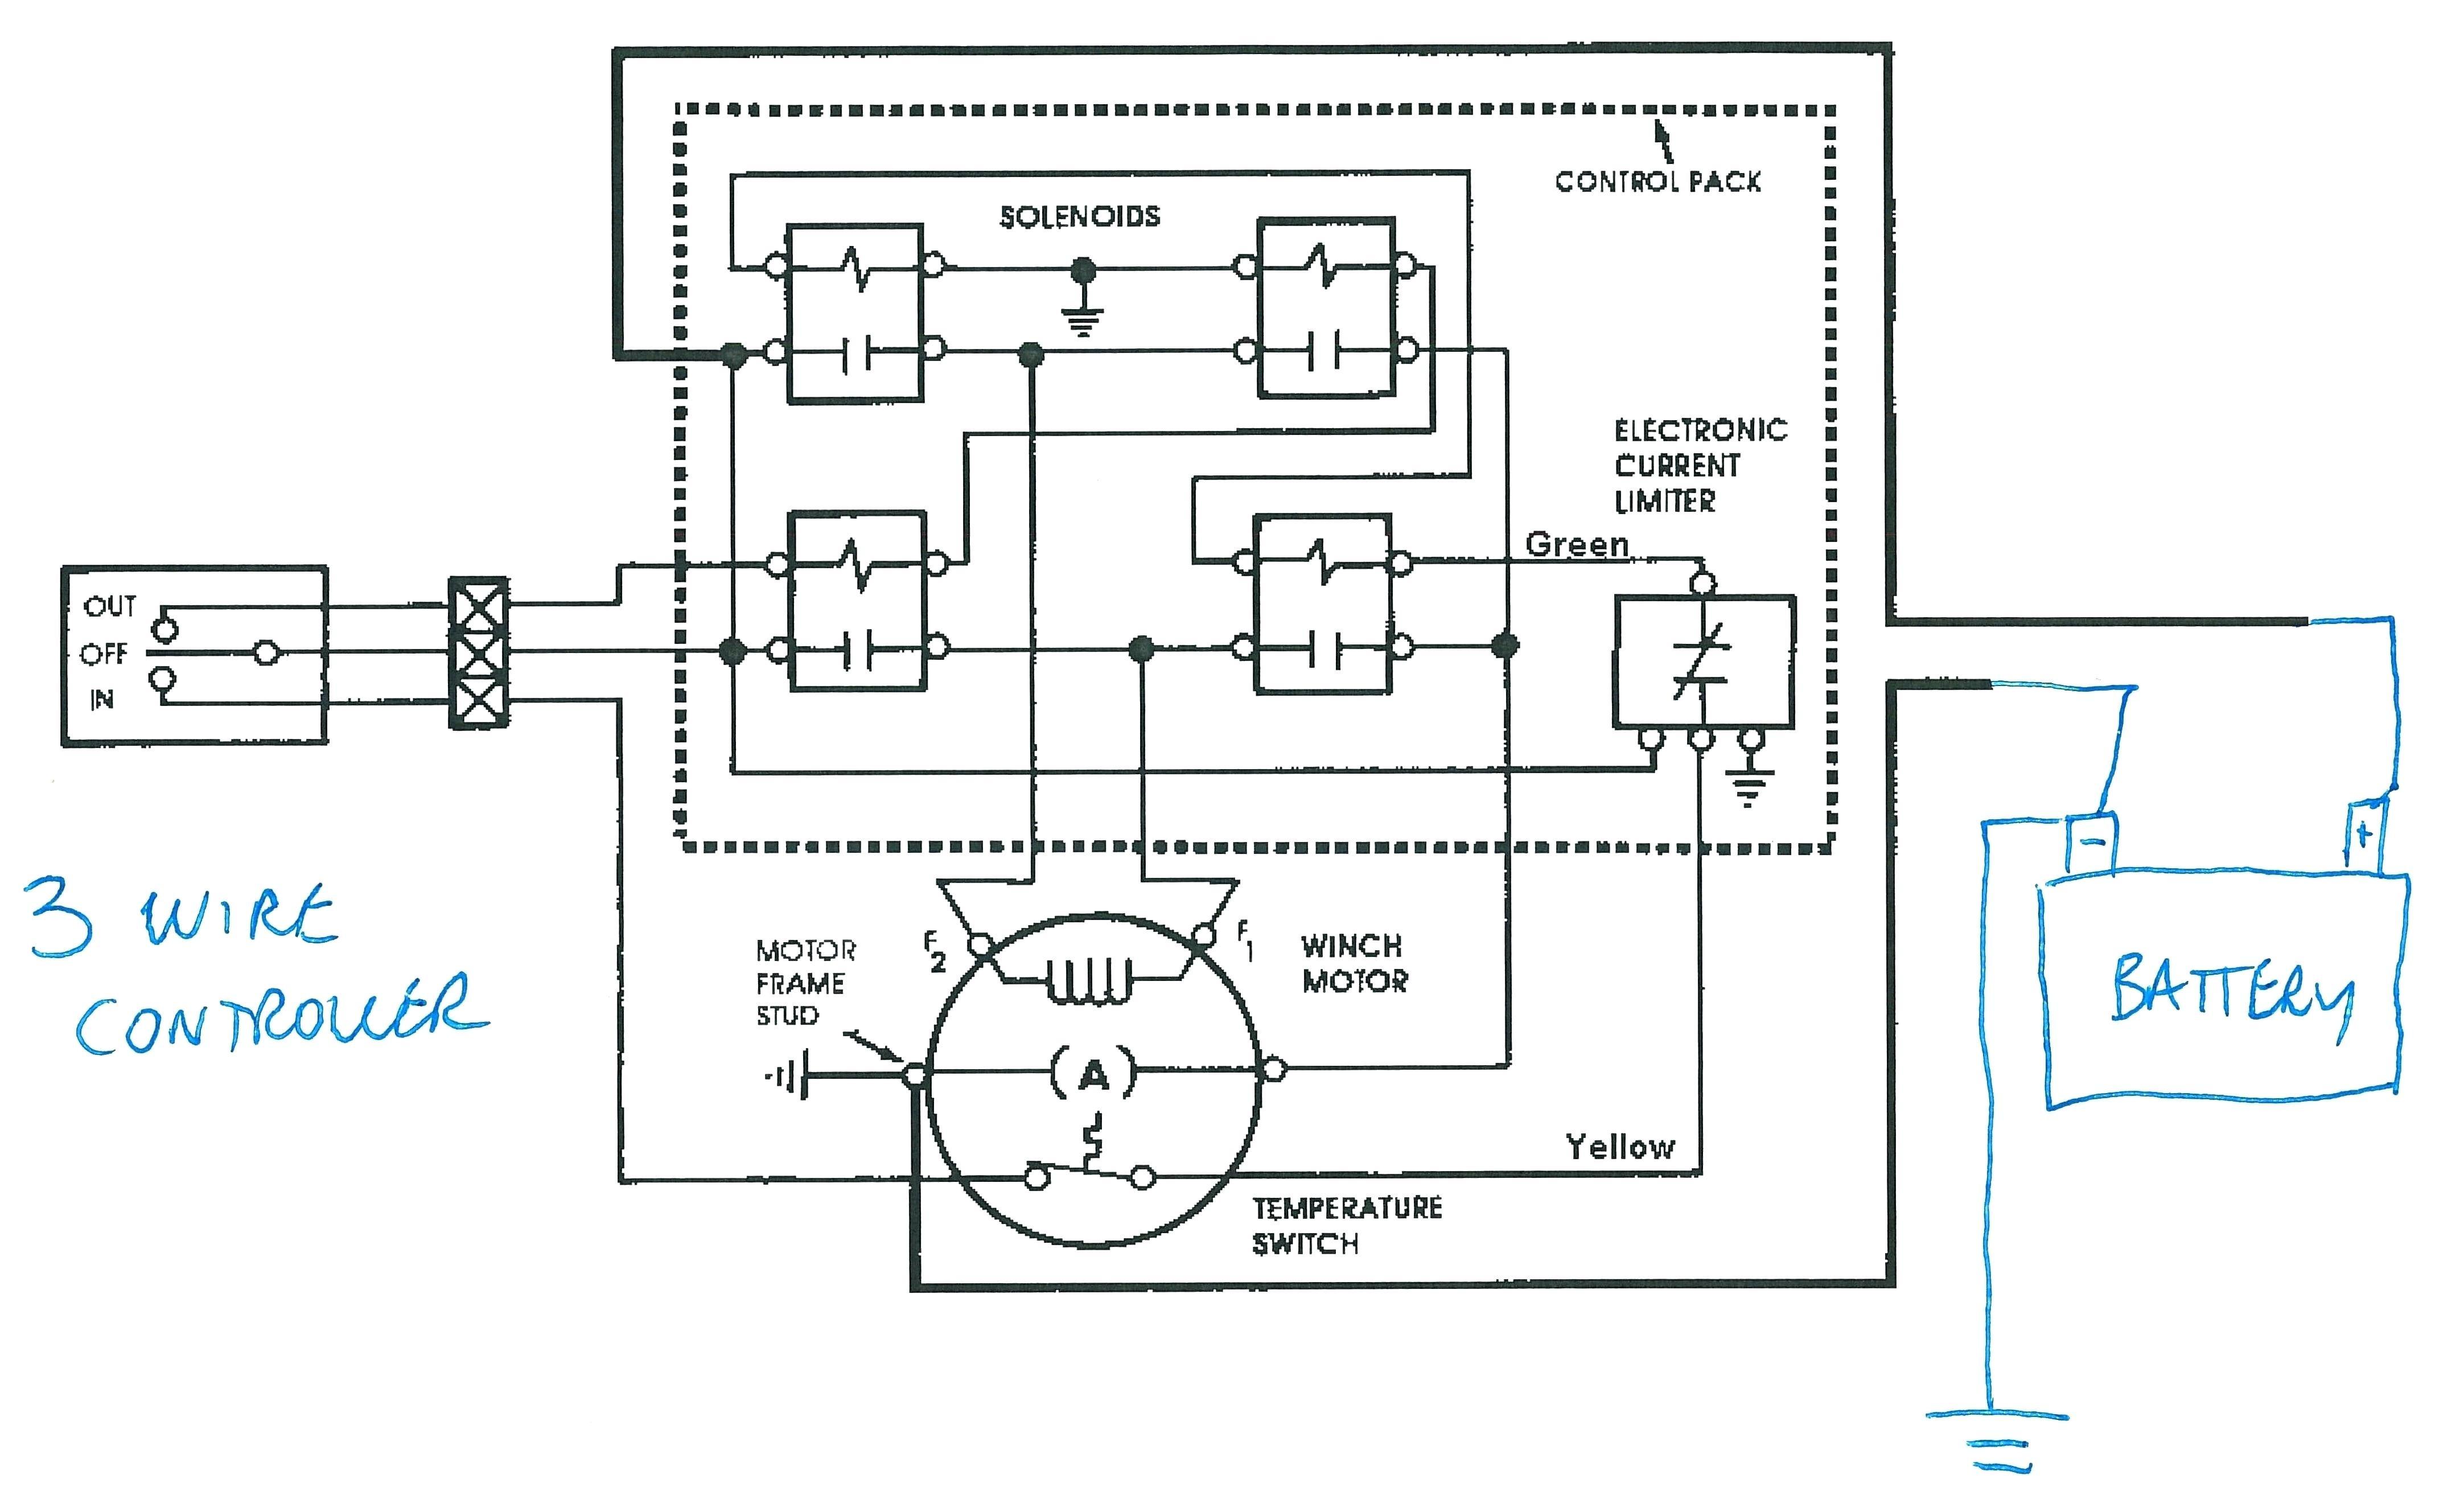 Upright Mx19 Scissor Lift Wiring Diagram